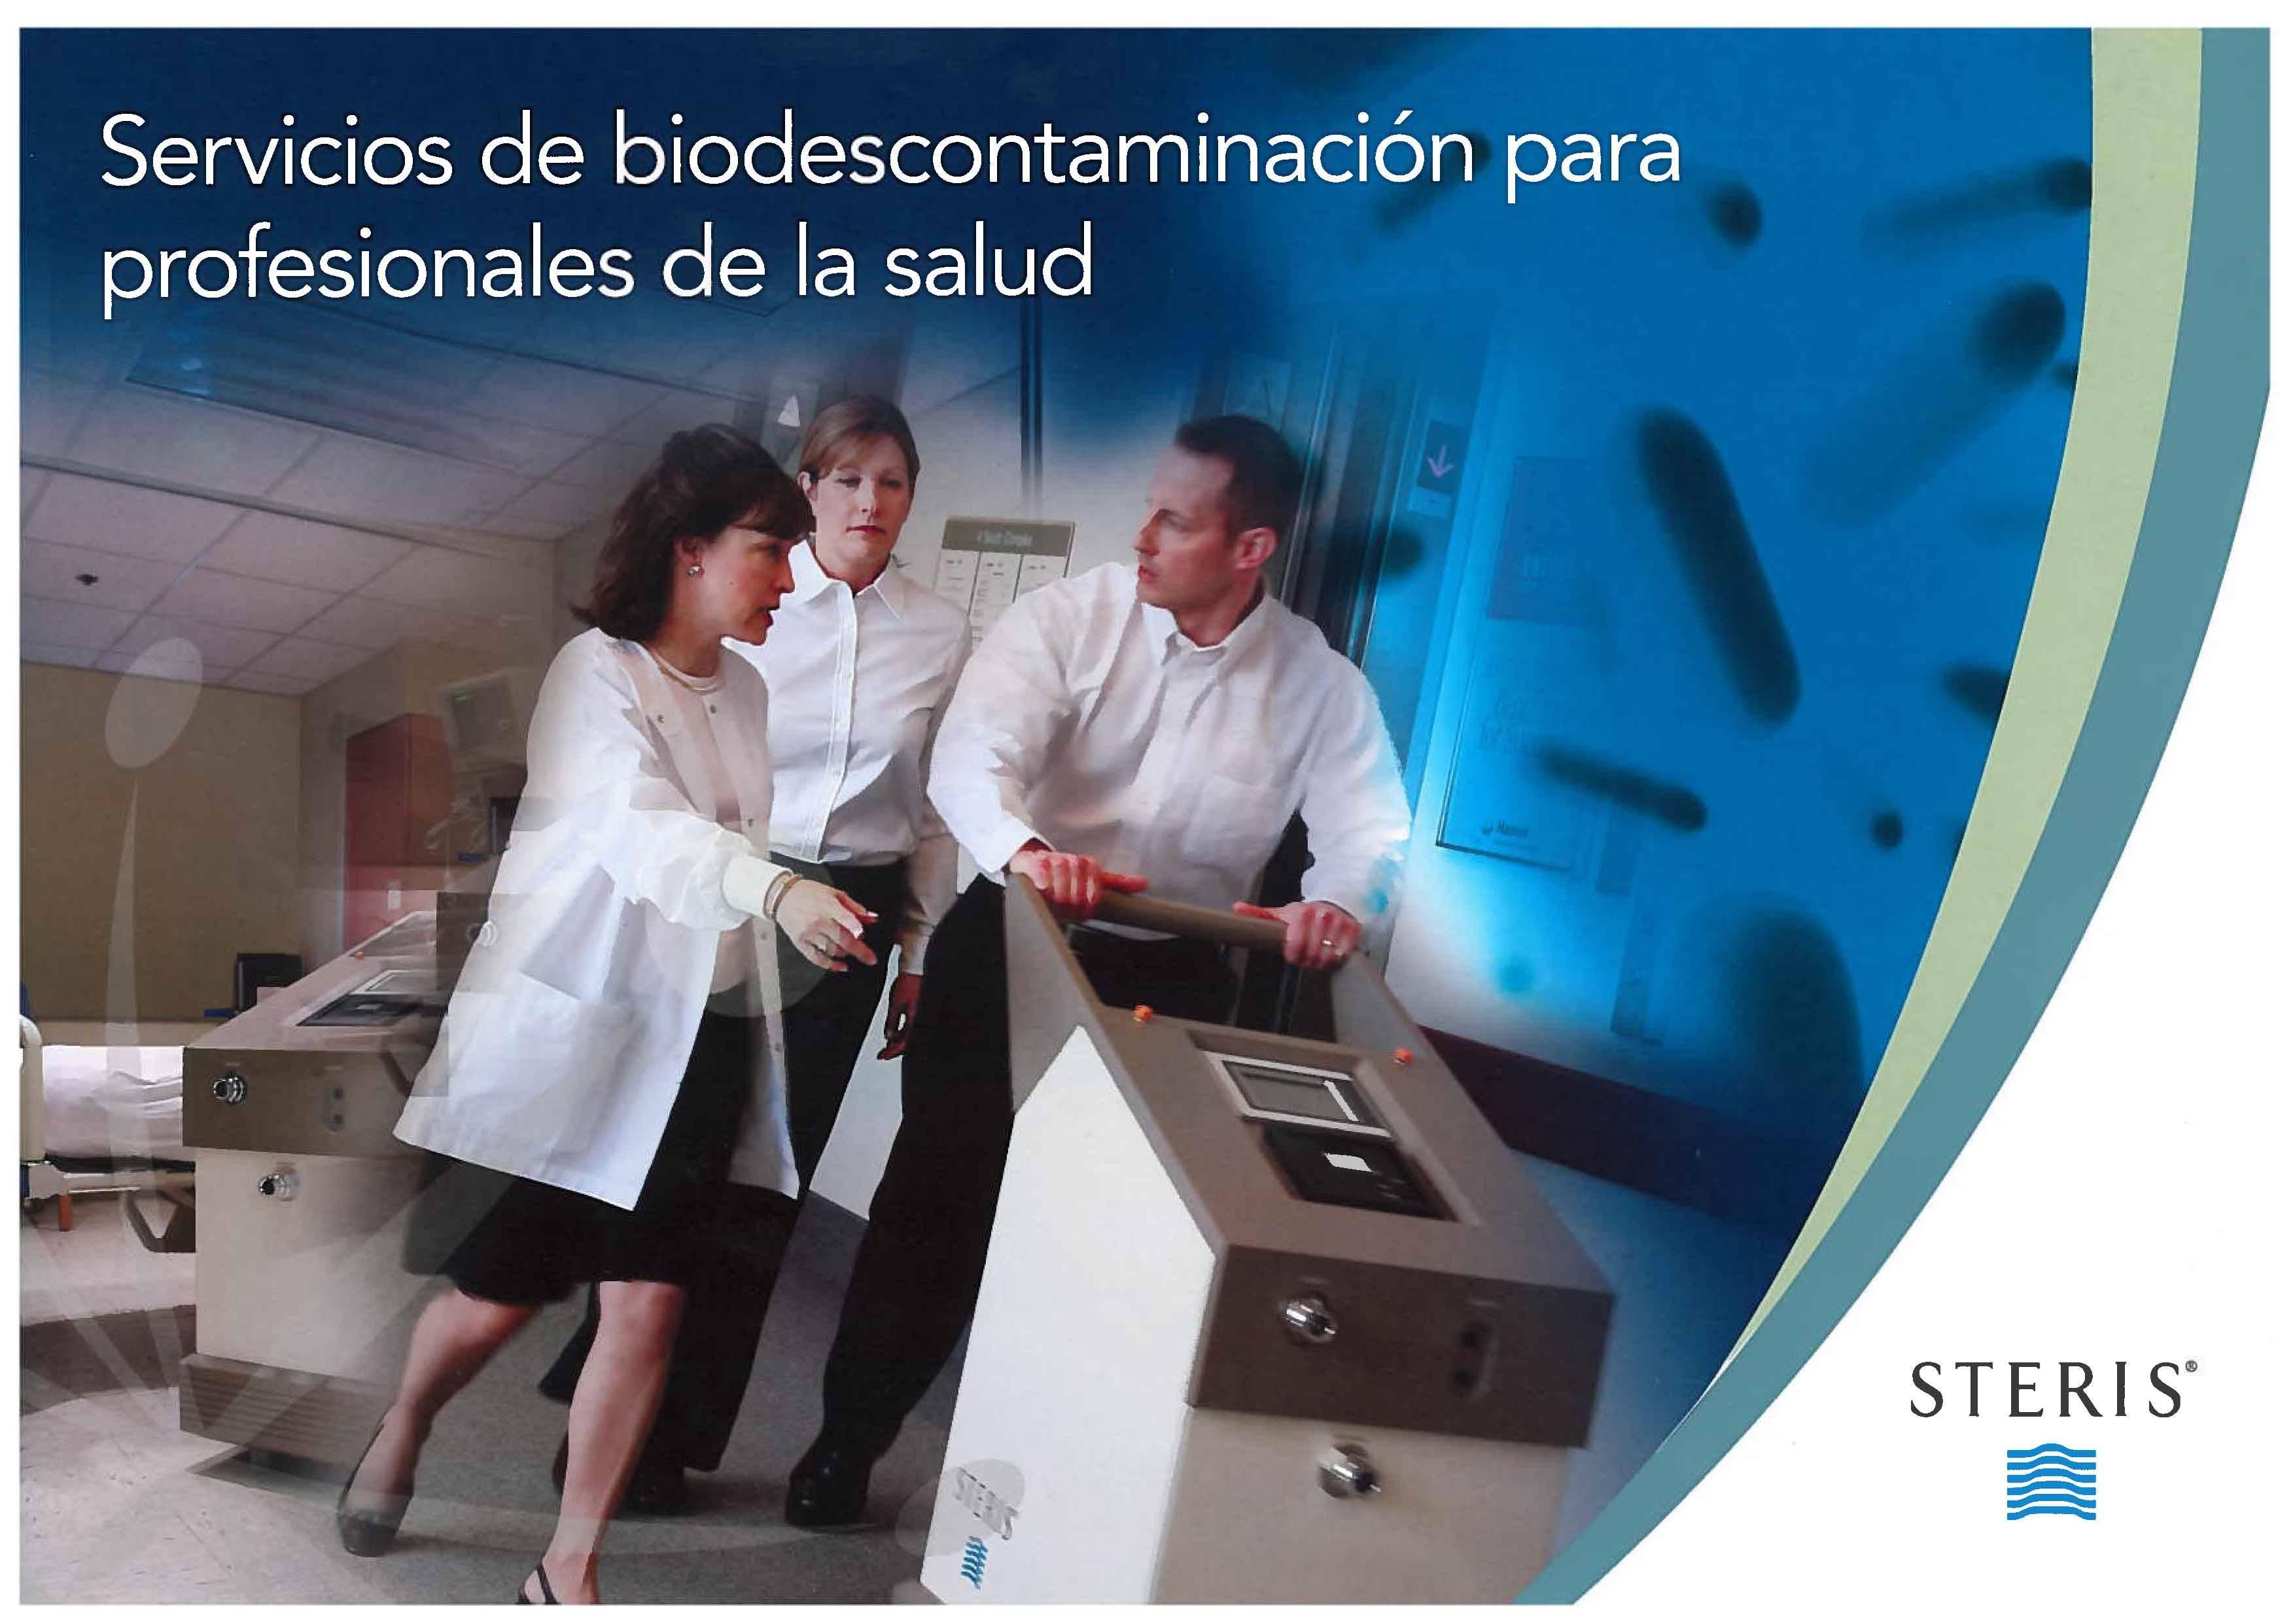 steris-biodescontaminacion